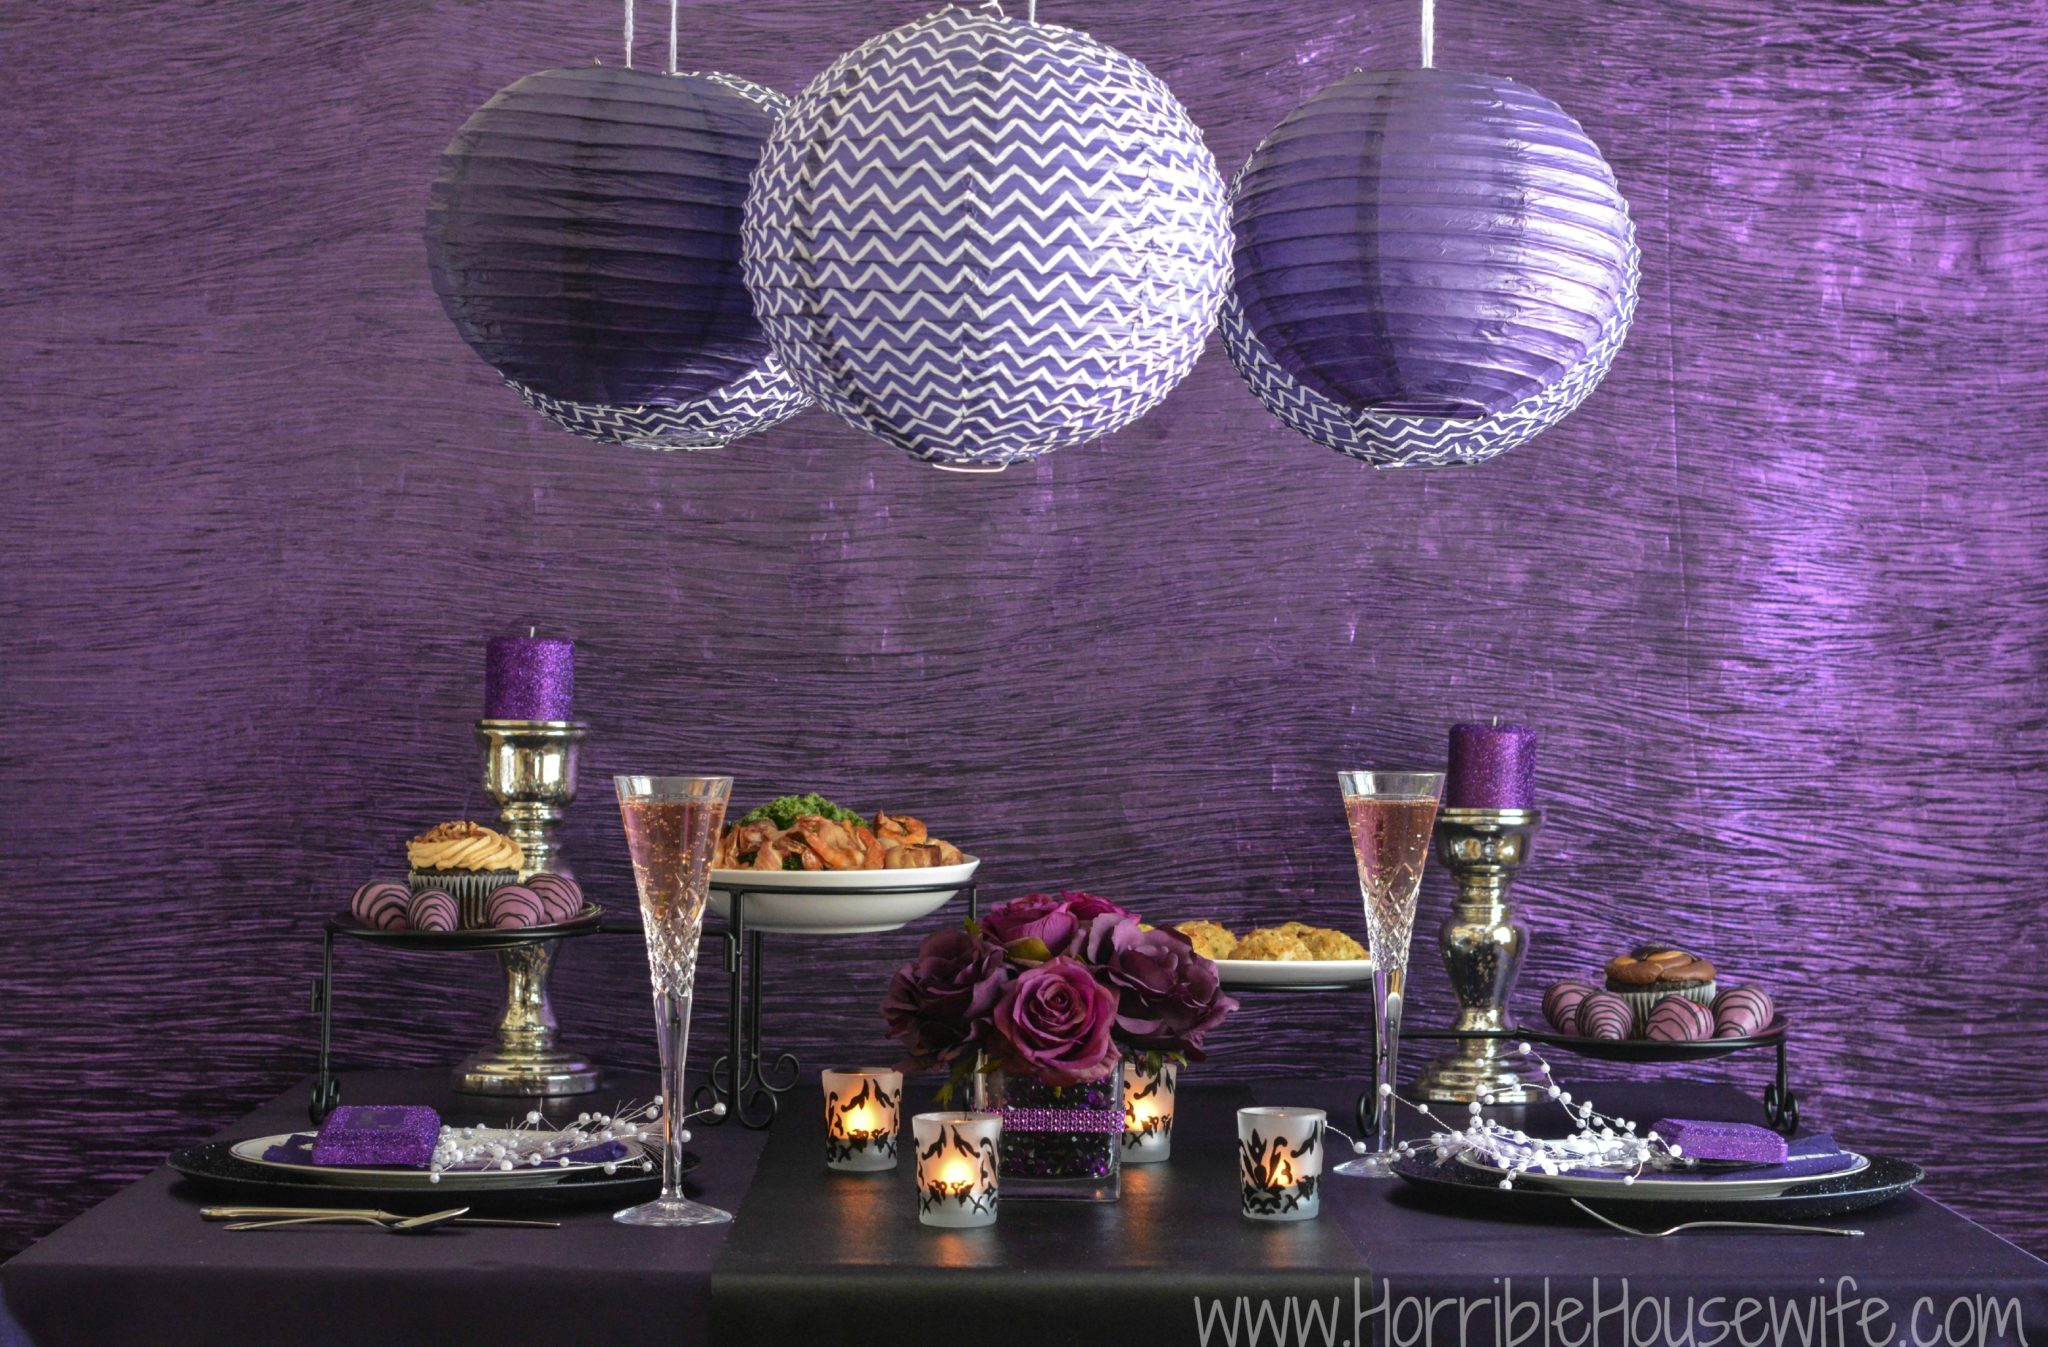 DIY-paper-lantern-in-many-shades-of-purple